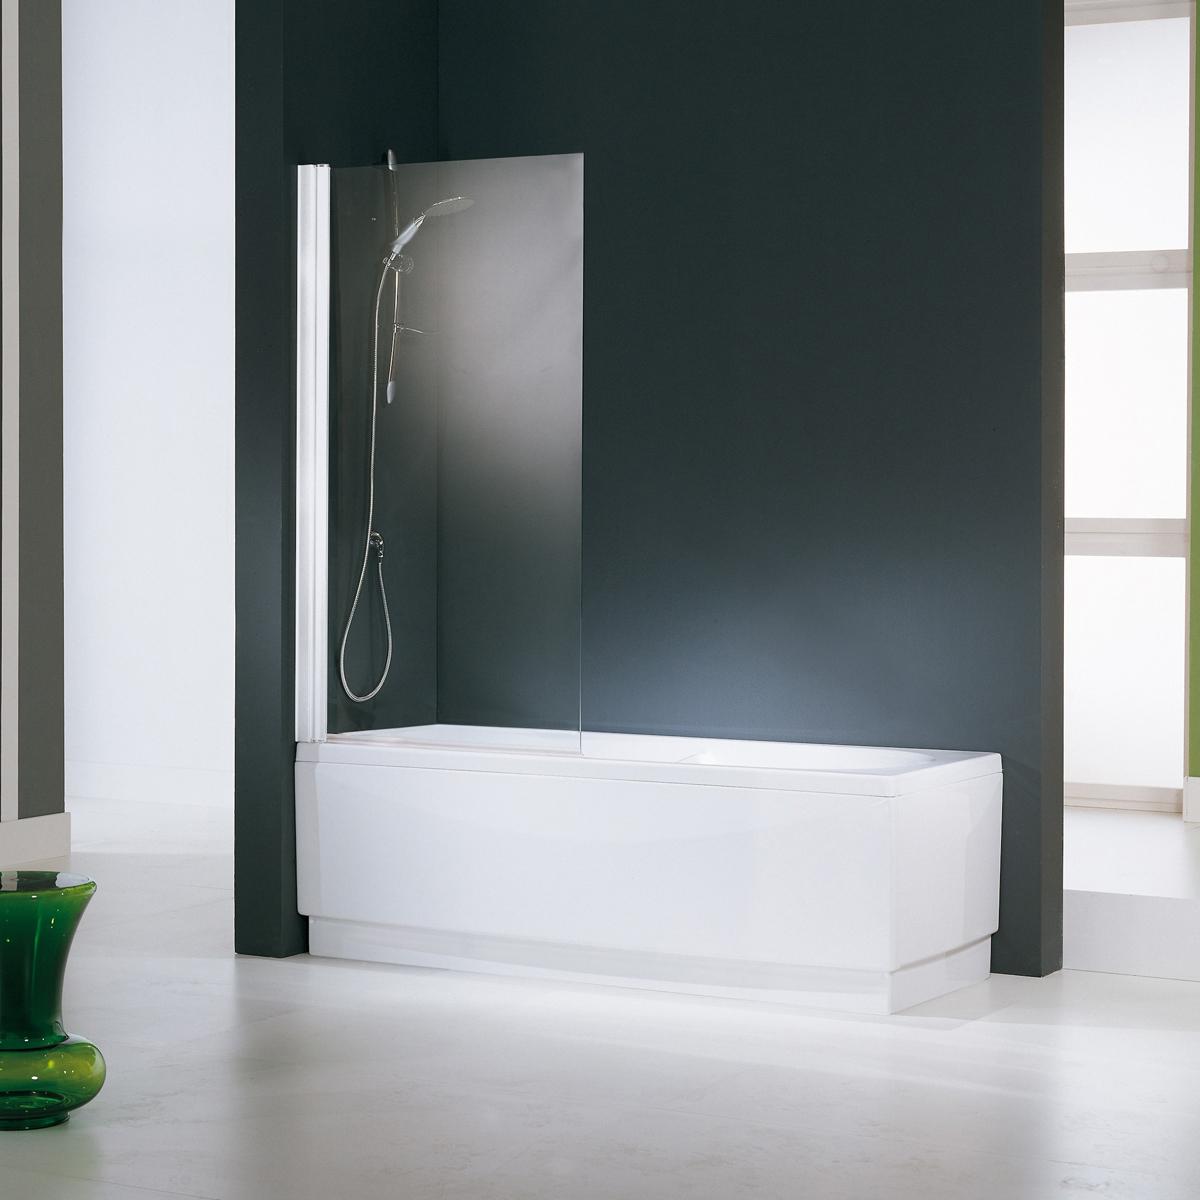 Ricambi originali novellini per pareti sopravasca linea - Miscelatori vasca da bagno leroy merlin ...